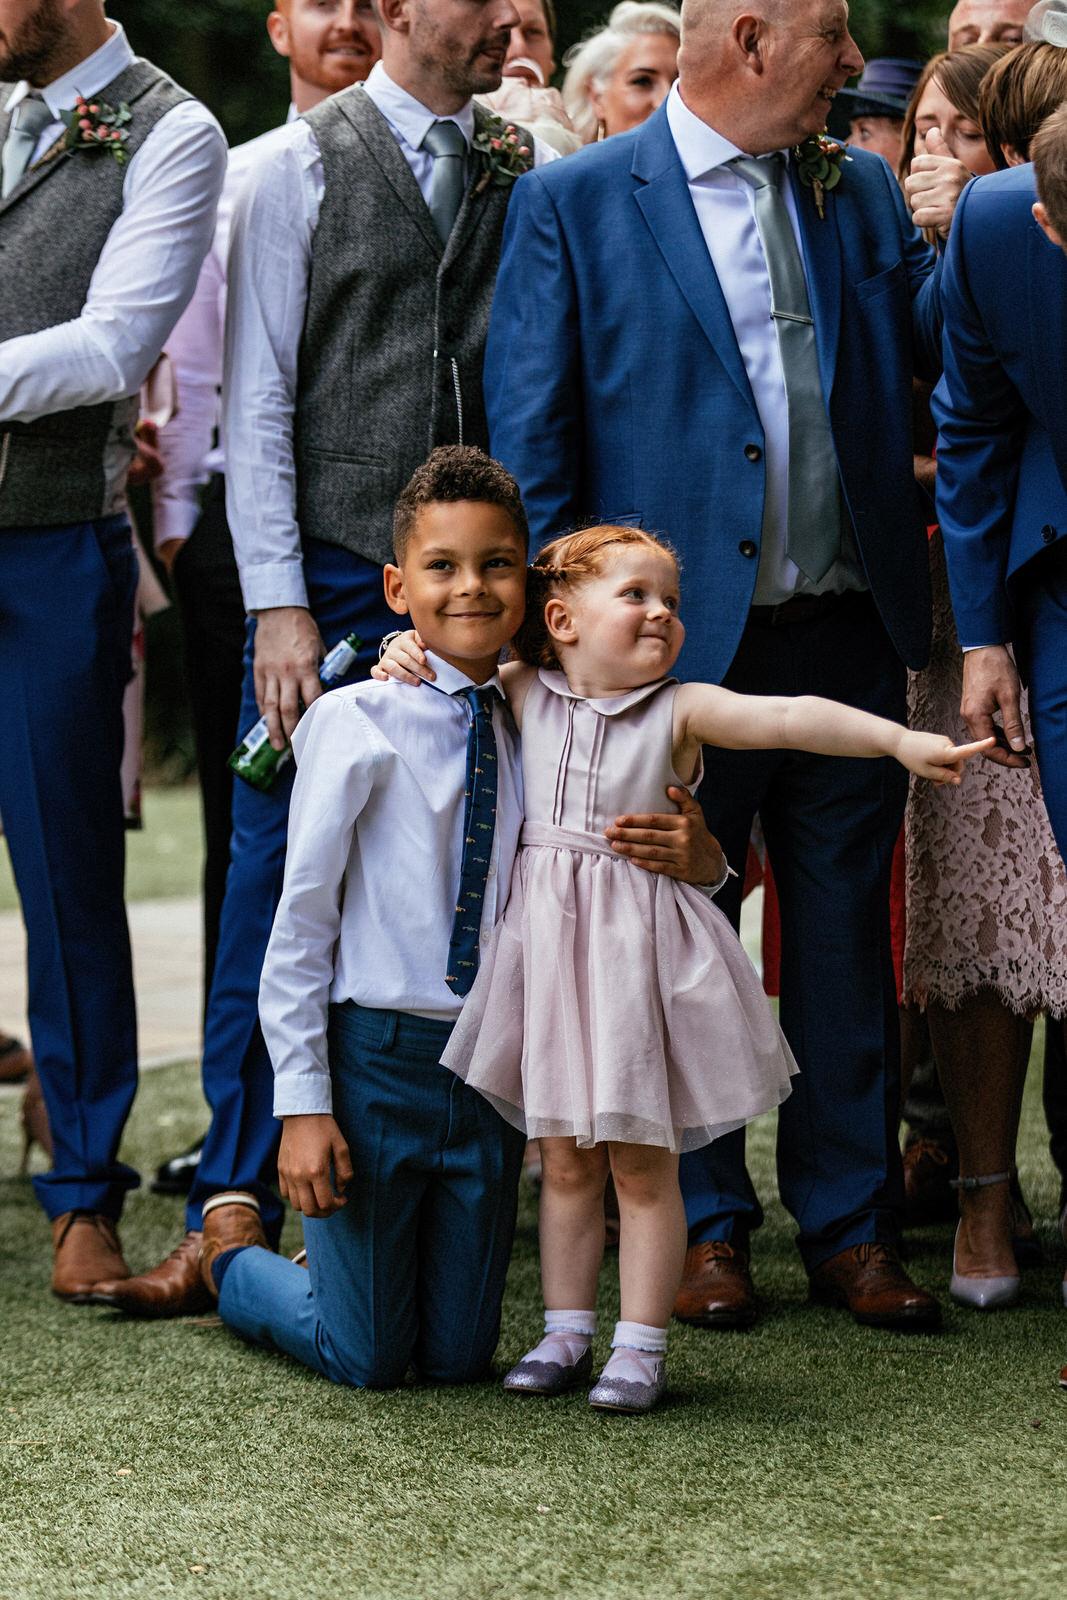 Moddershall-Oaks-Spa-Wedding-Photographer-032.jpg